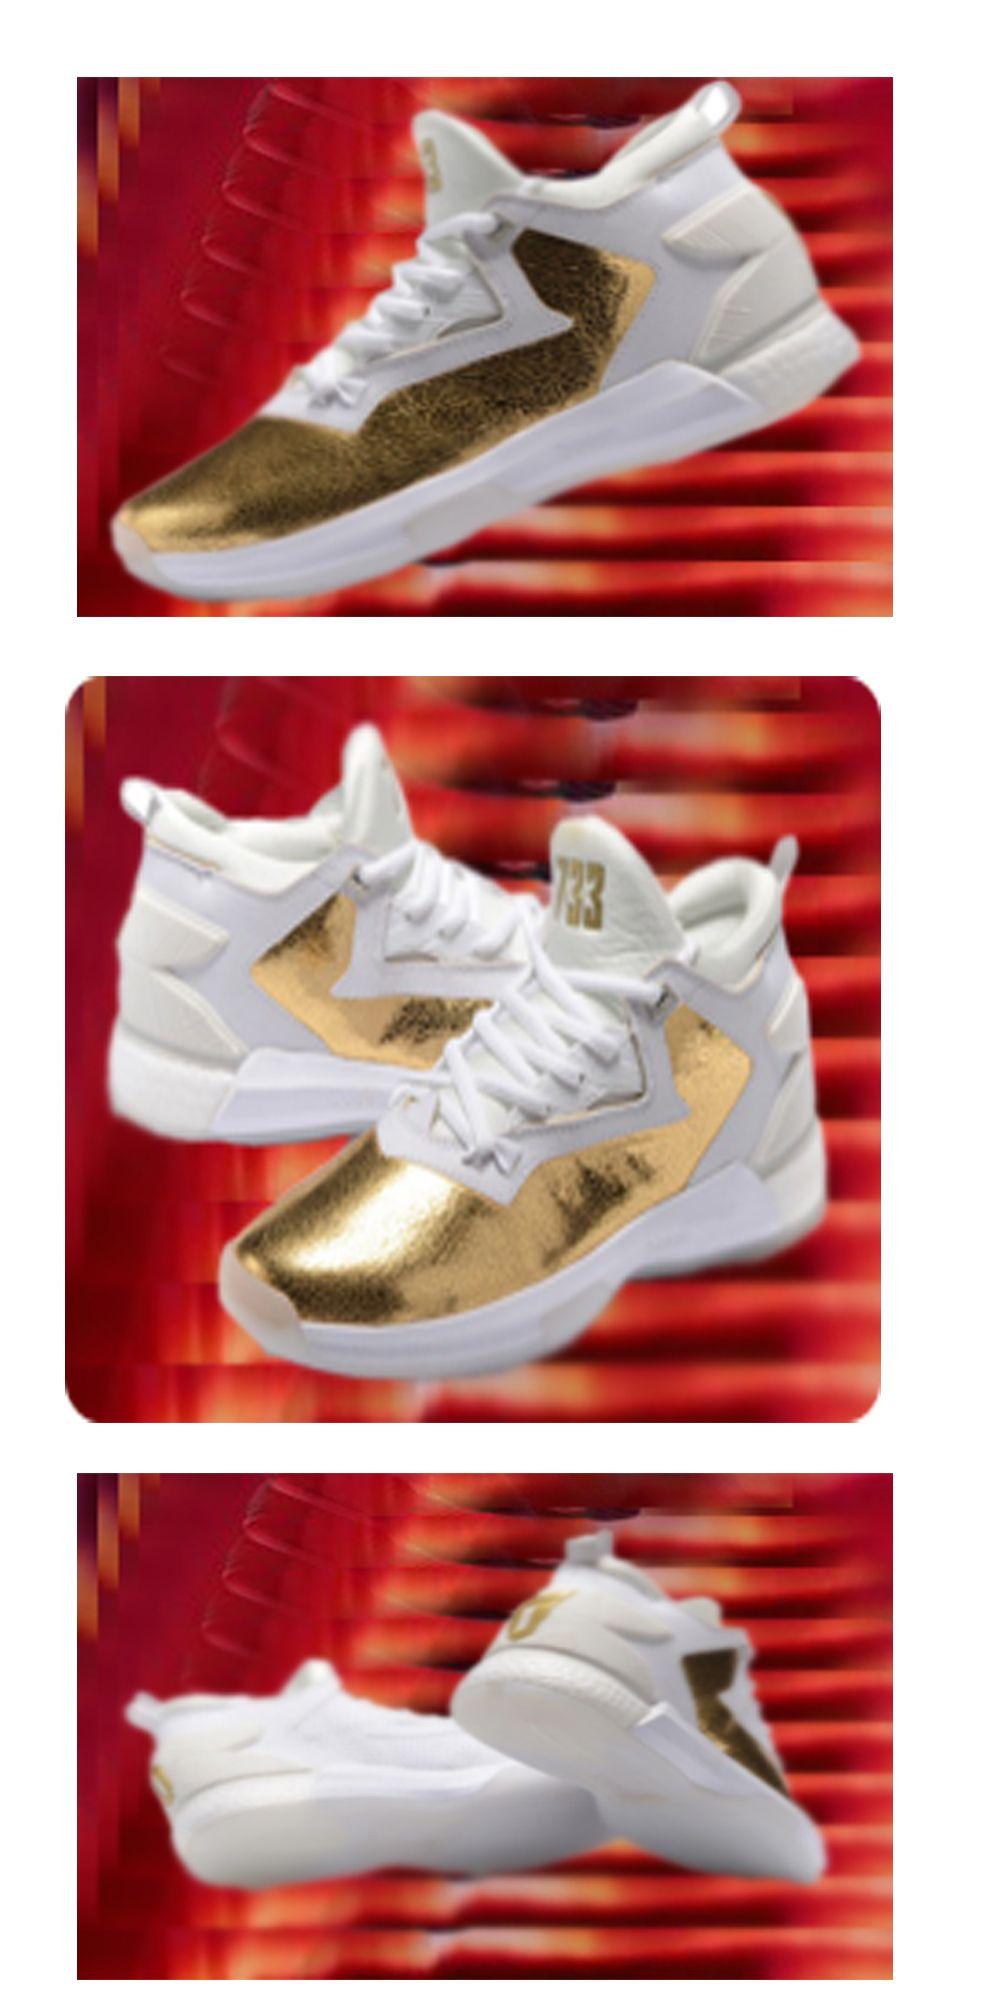 Damianlillard2 Shoes Allstargame Basketballshoes Leisureshoes